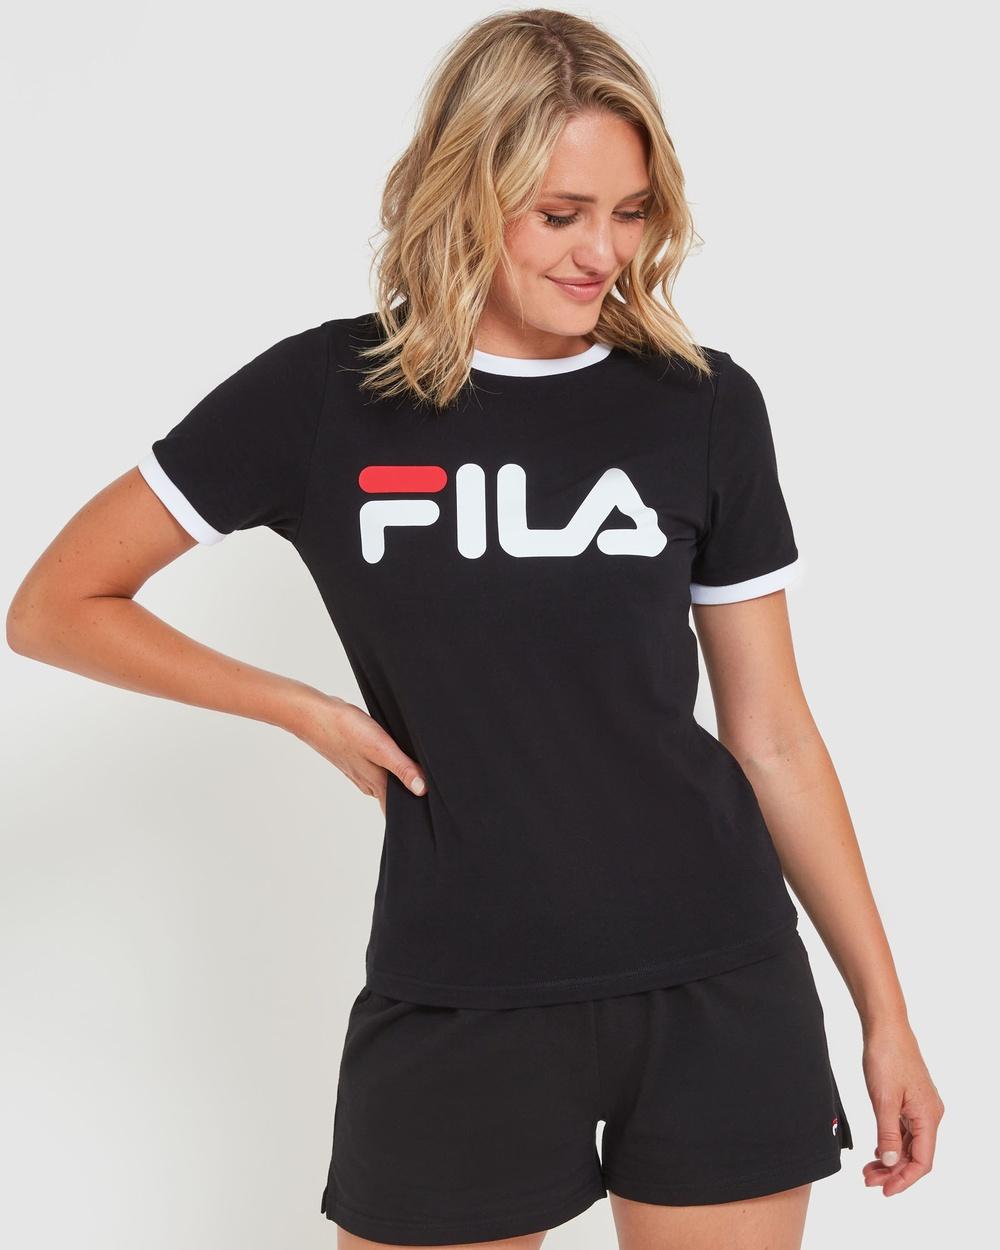 Fila Classic Ringer Tee T-Shirts & Singlets Black Australia